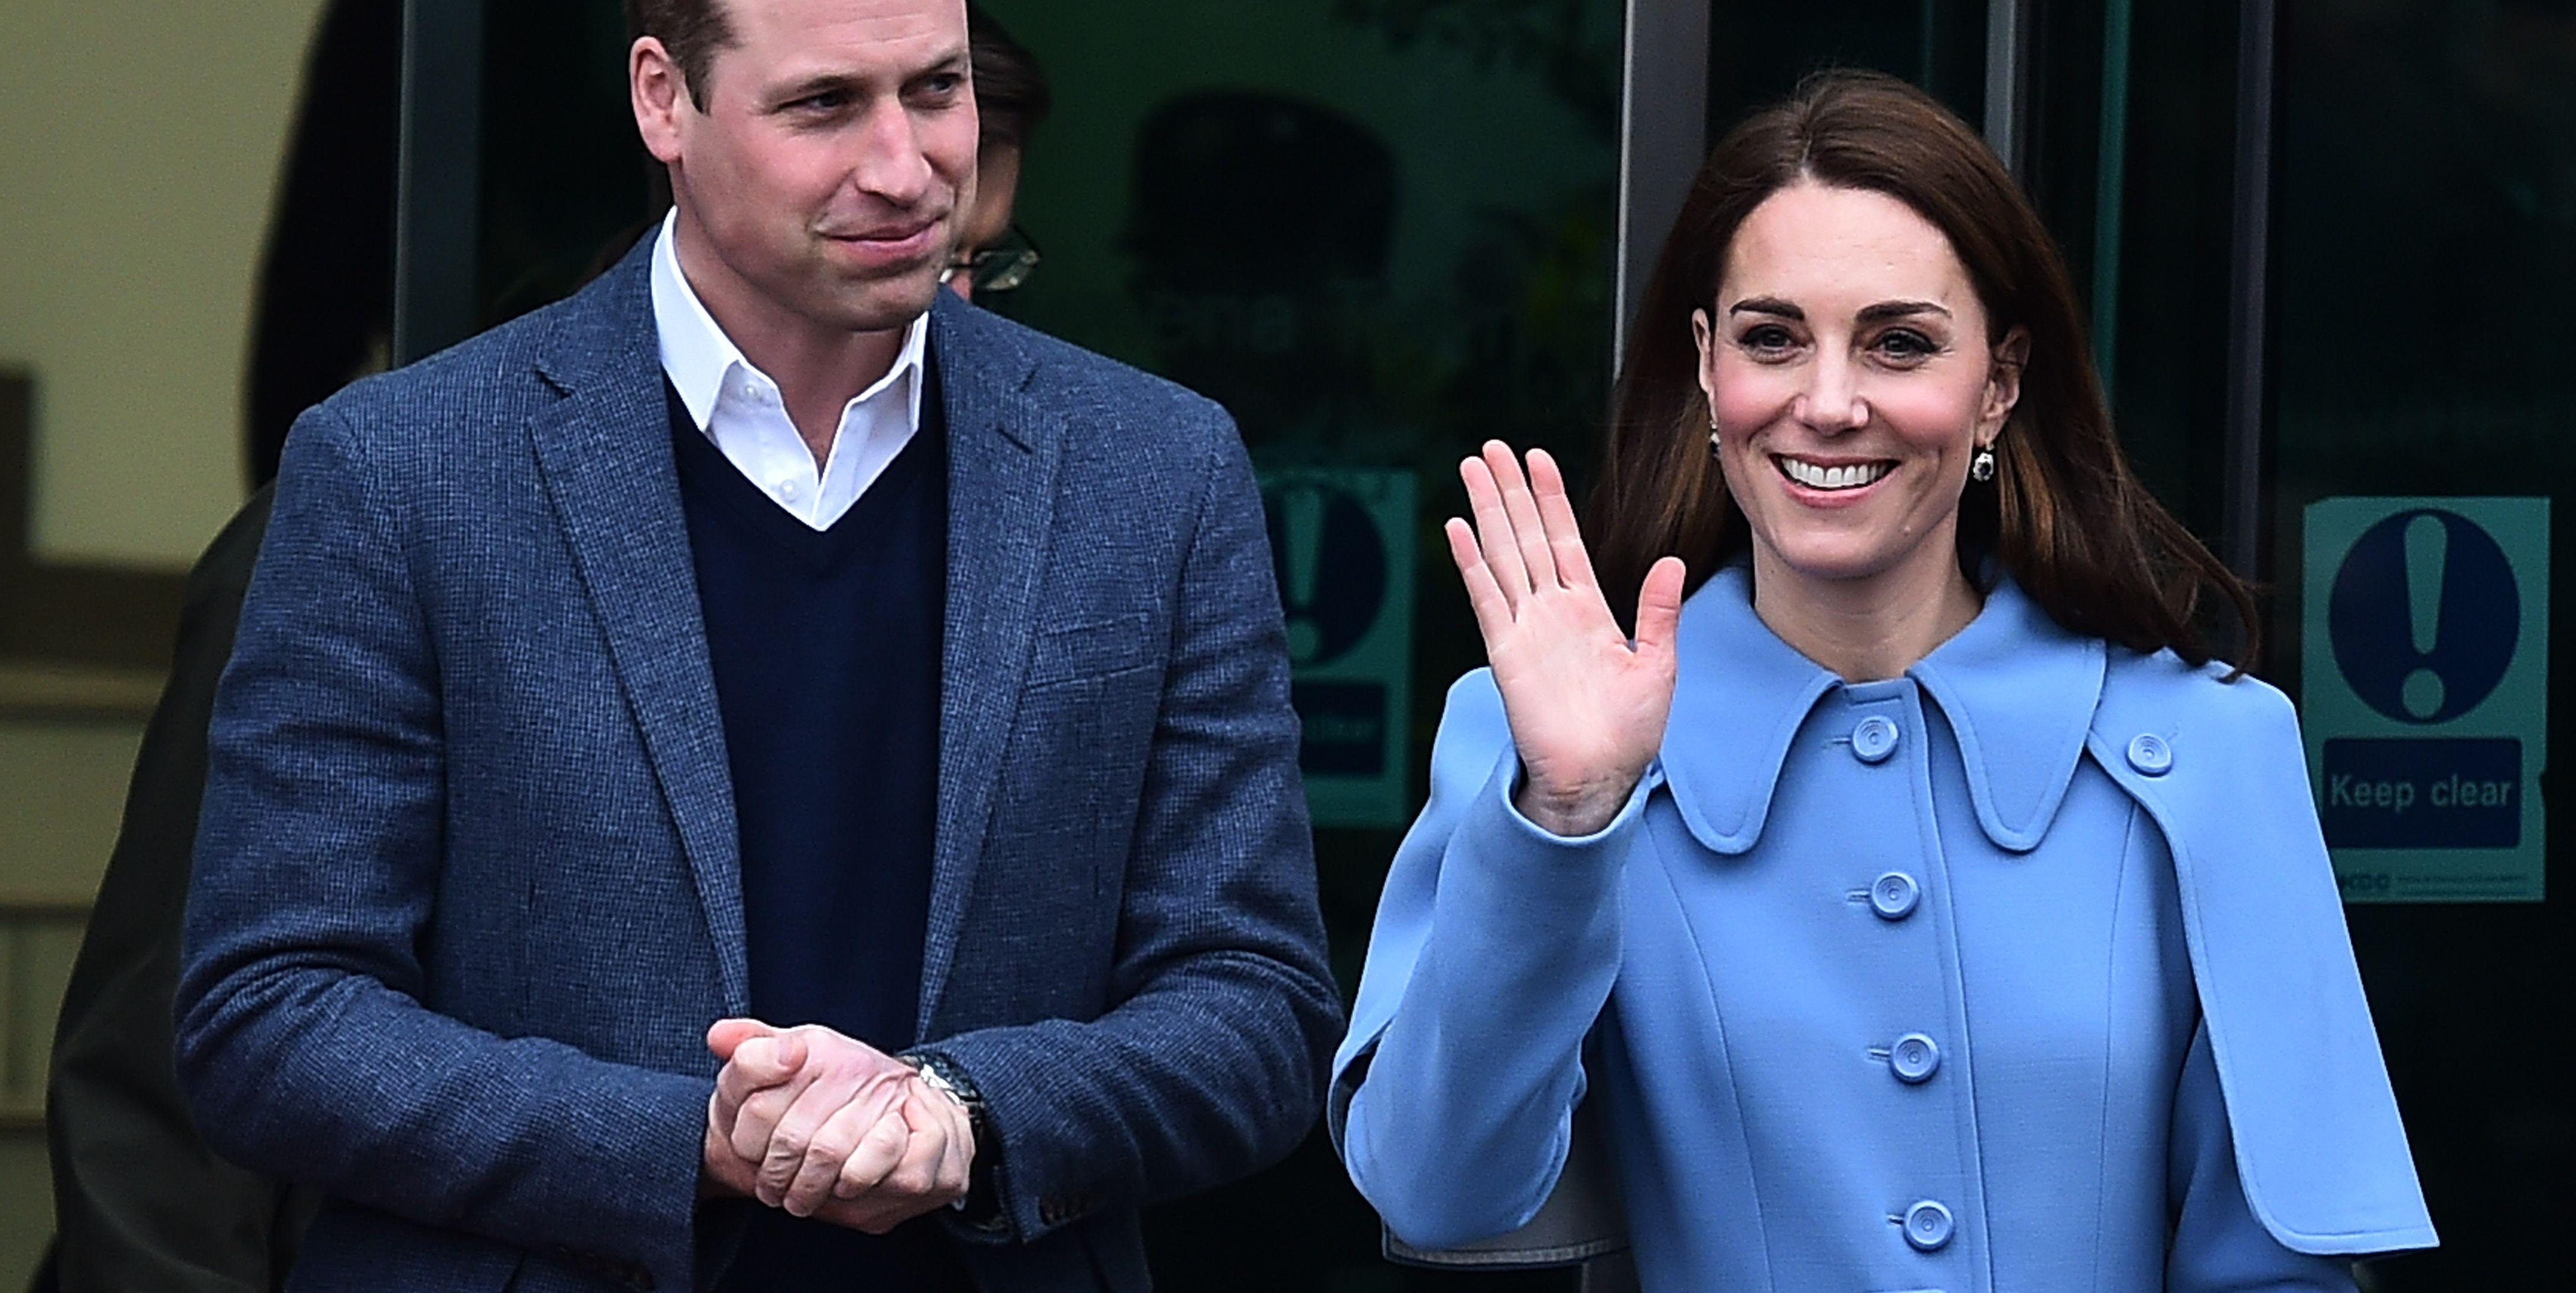 principe-william-kate-middleton-royal-family